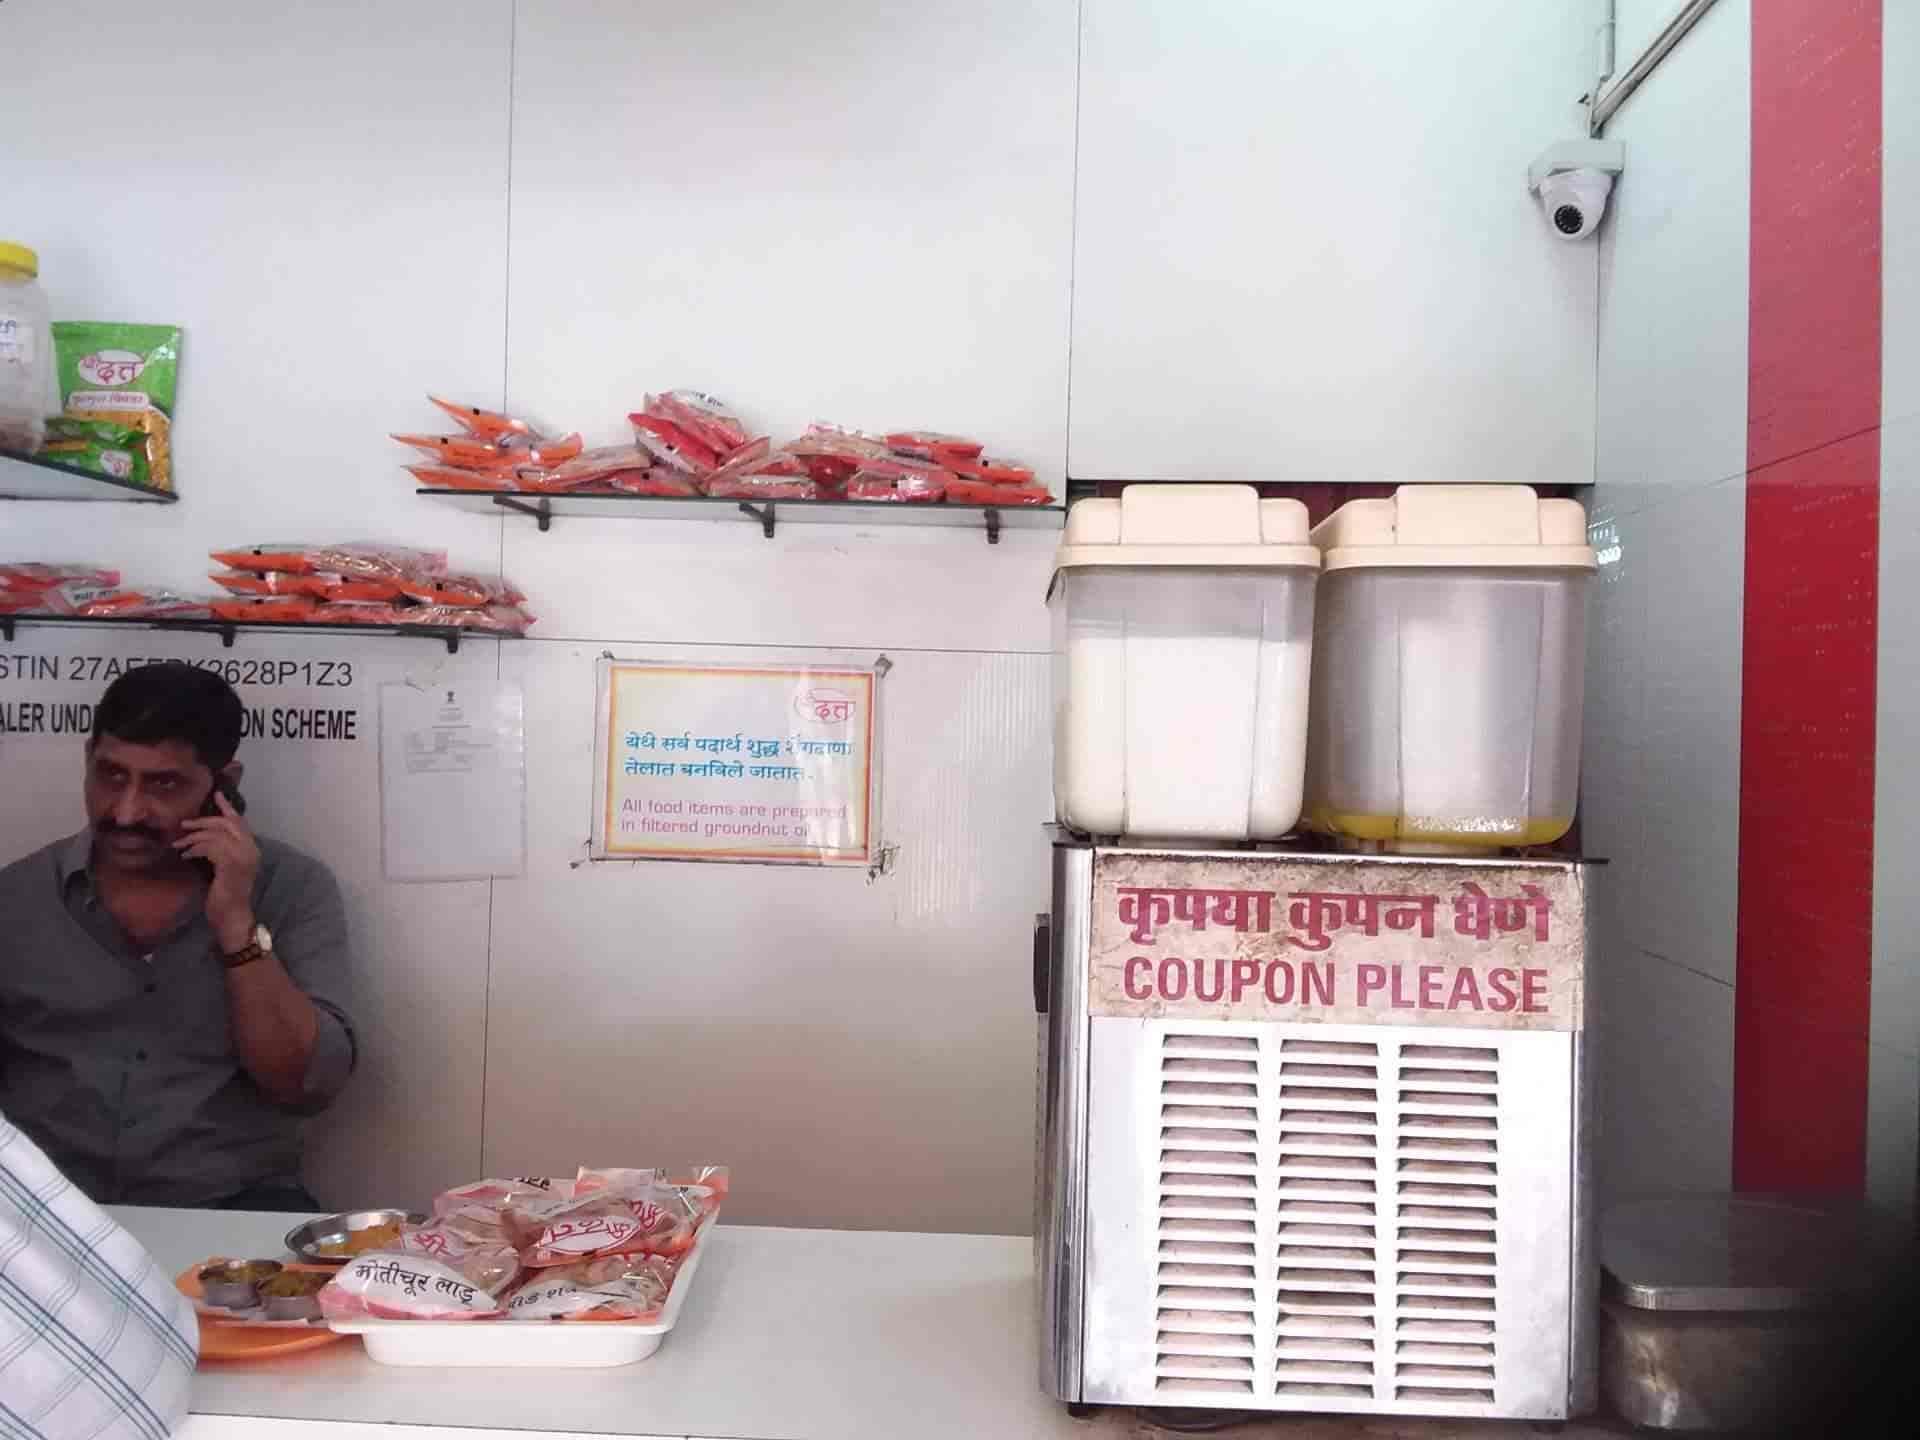 Shree Datta Snacks Spot, Goregaon East, Mumbai - Street Food